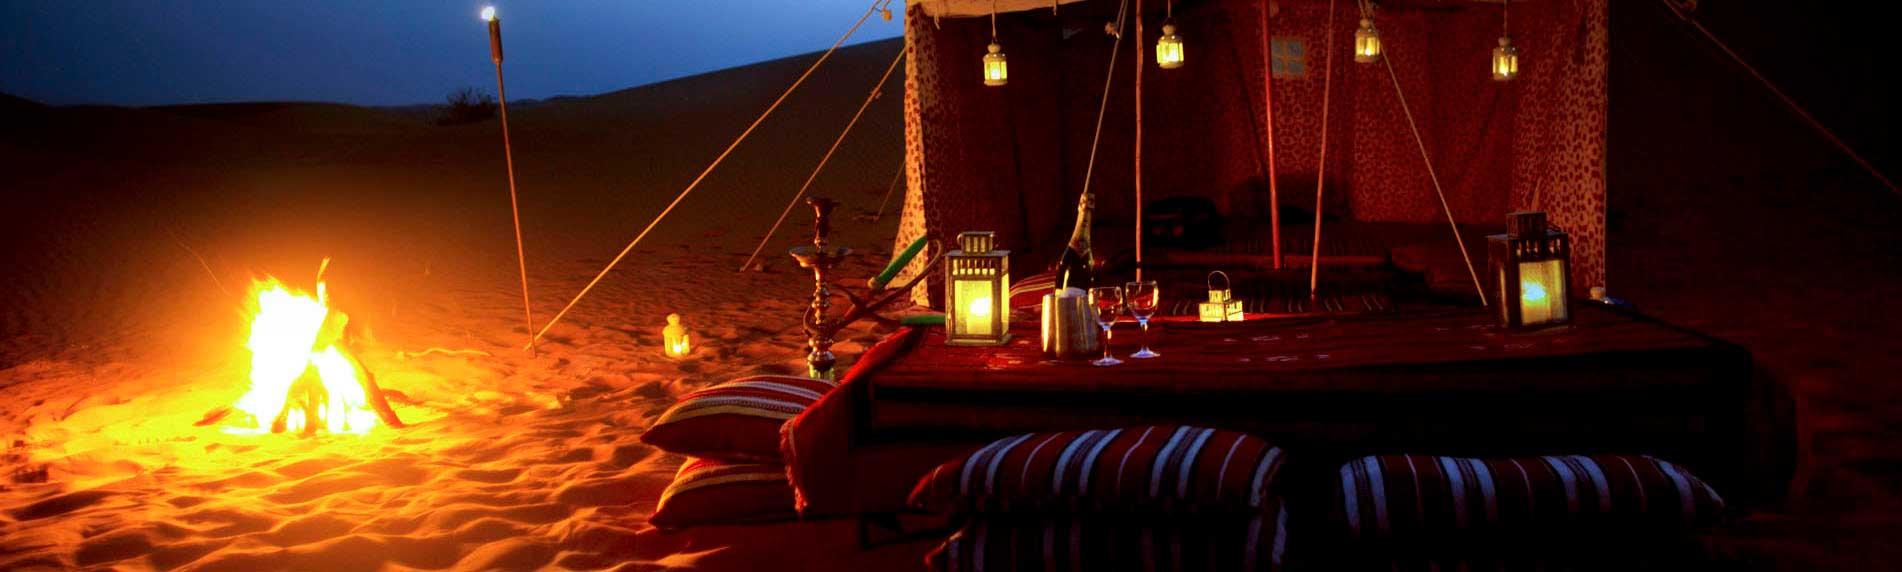 Beautiful Dubai 3 Nights Package